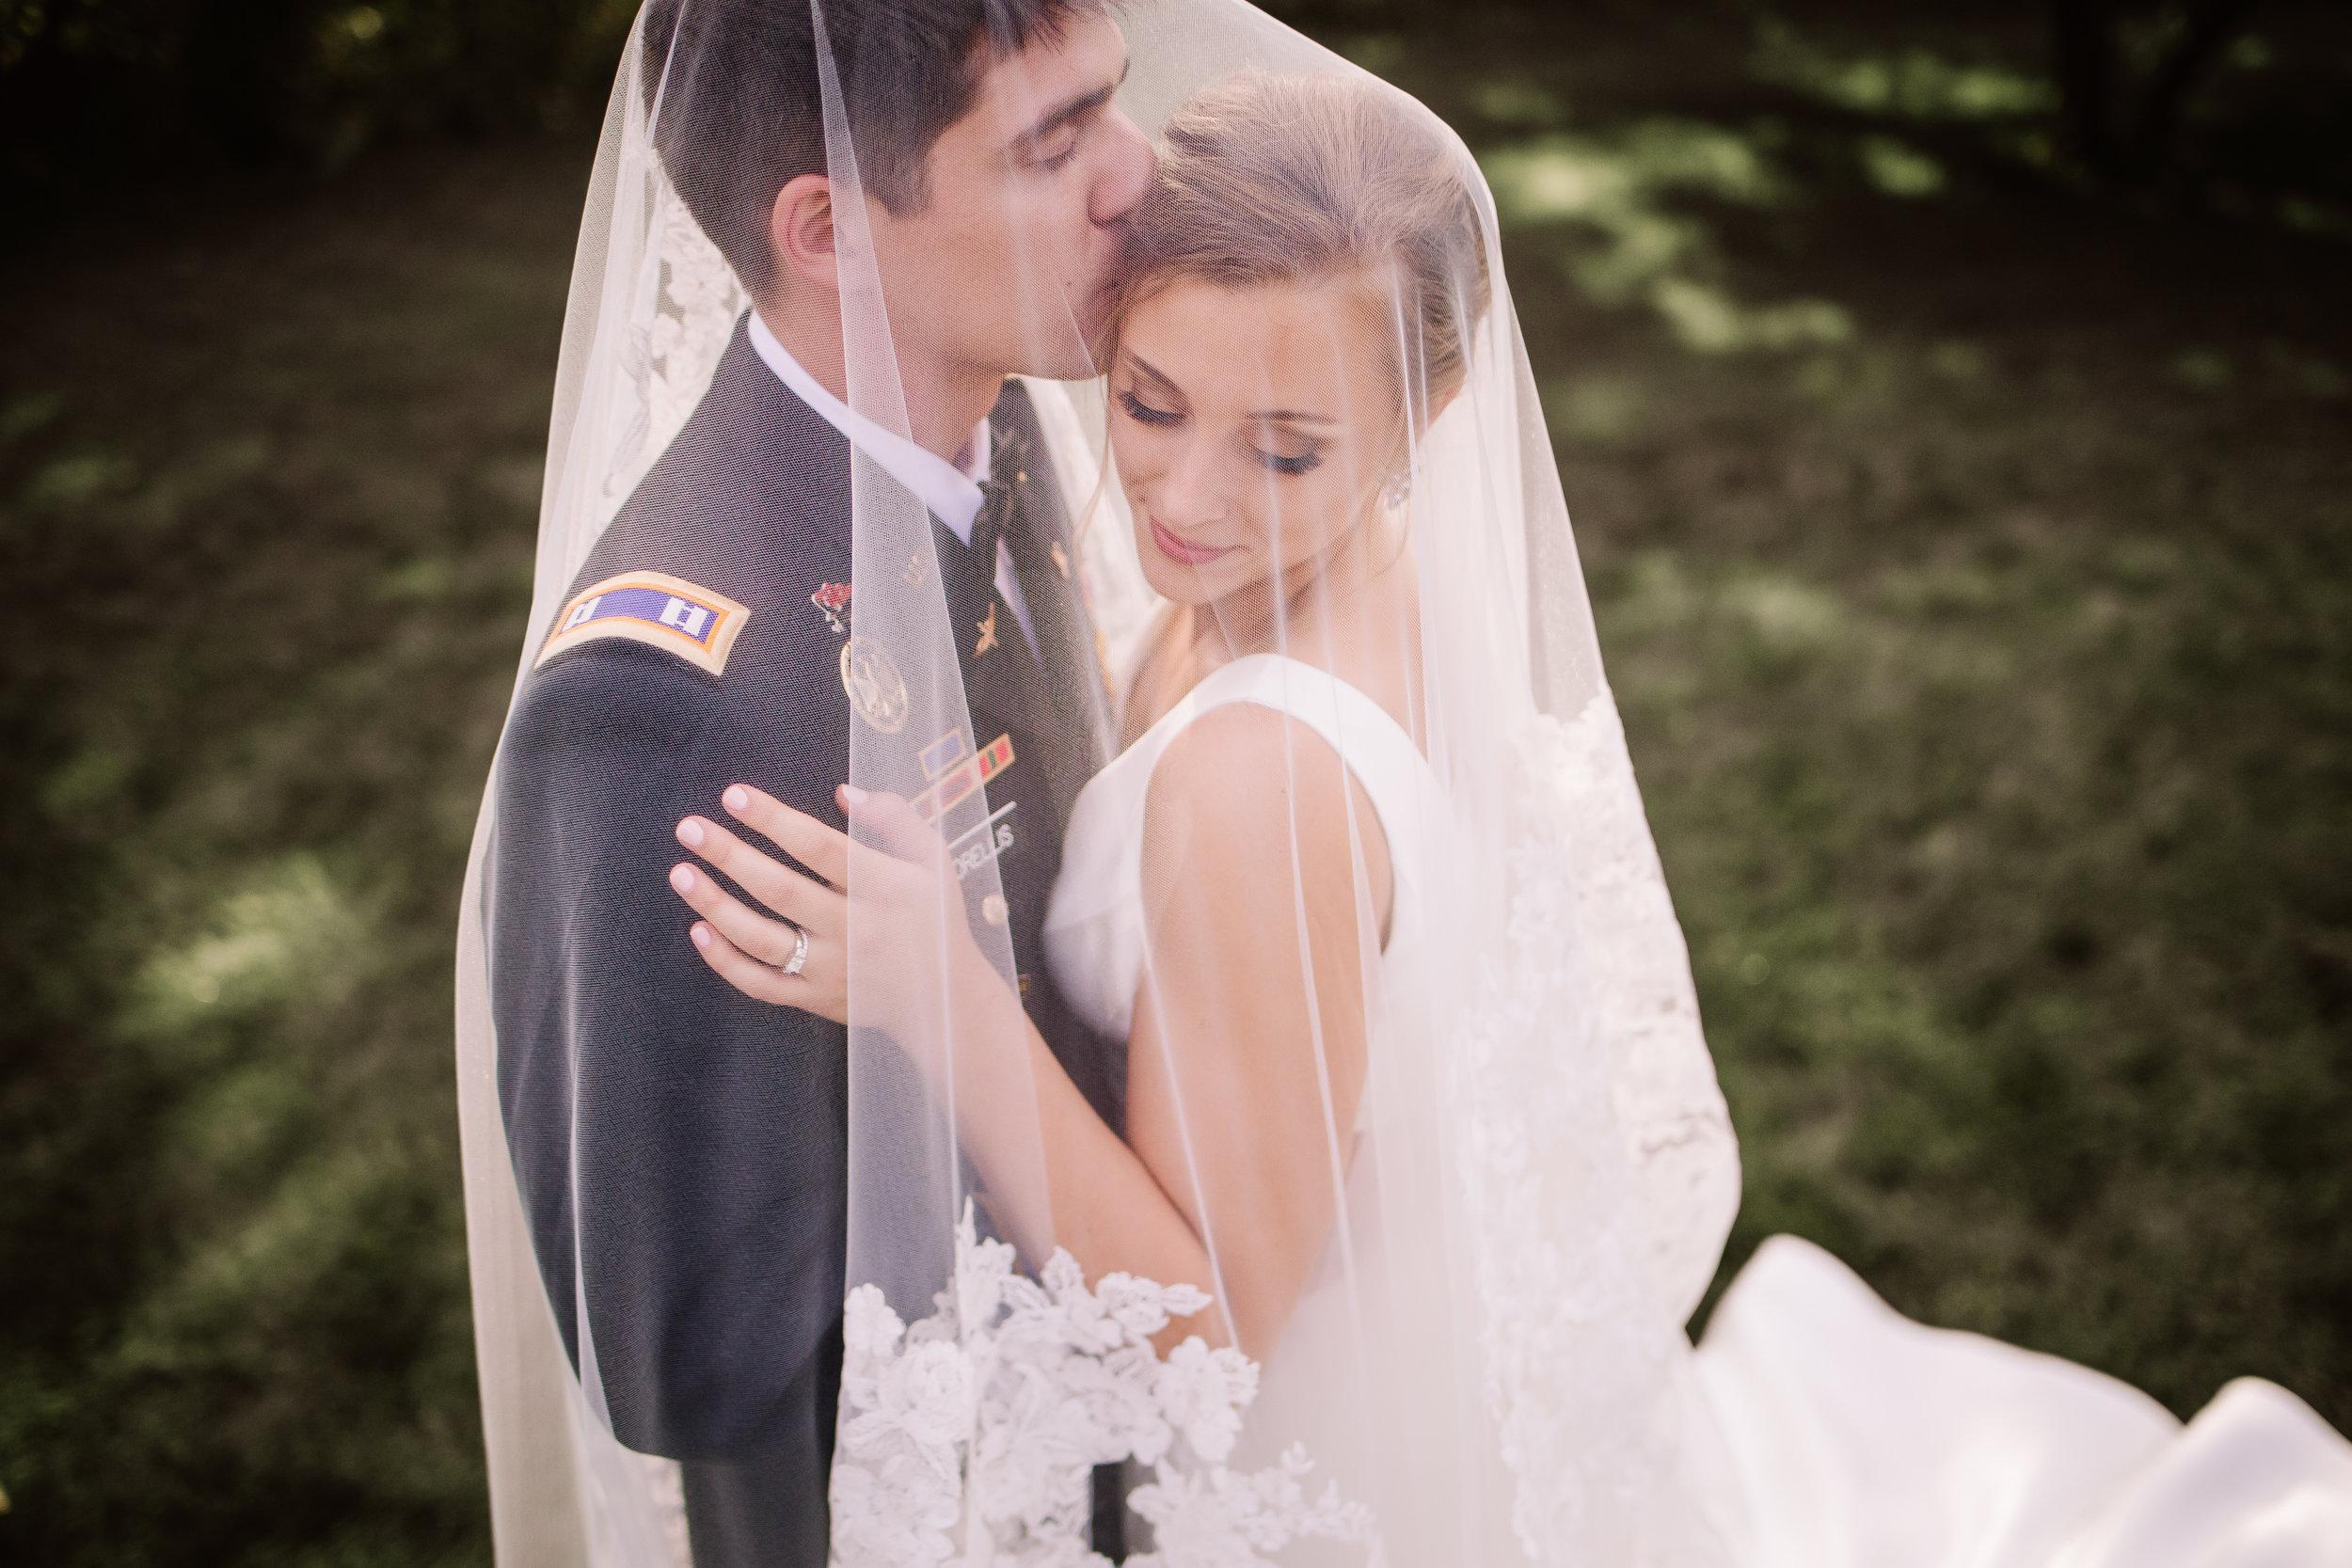 Bride-and-groom-wedding-pose-ideas-lauren-ashley-studios.jpg